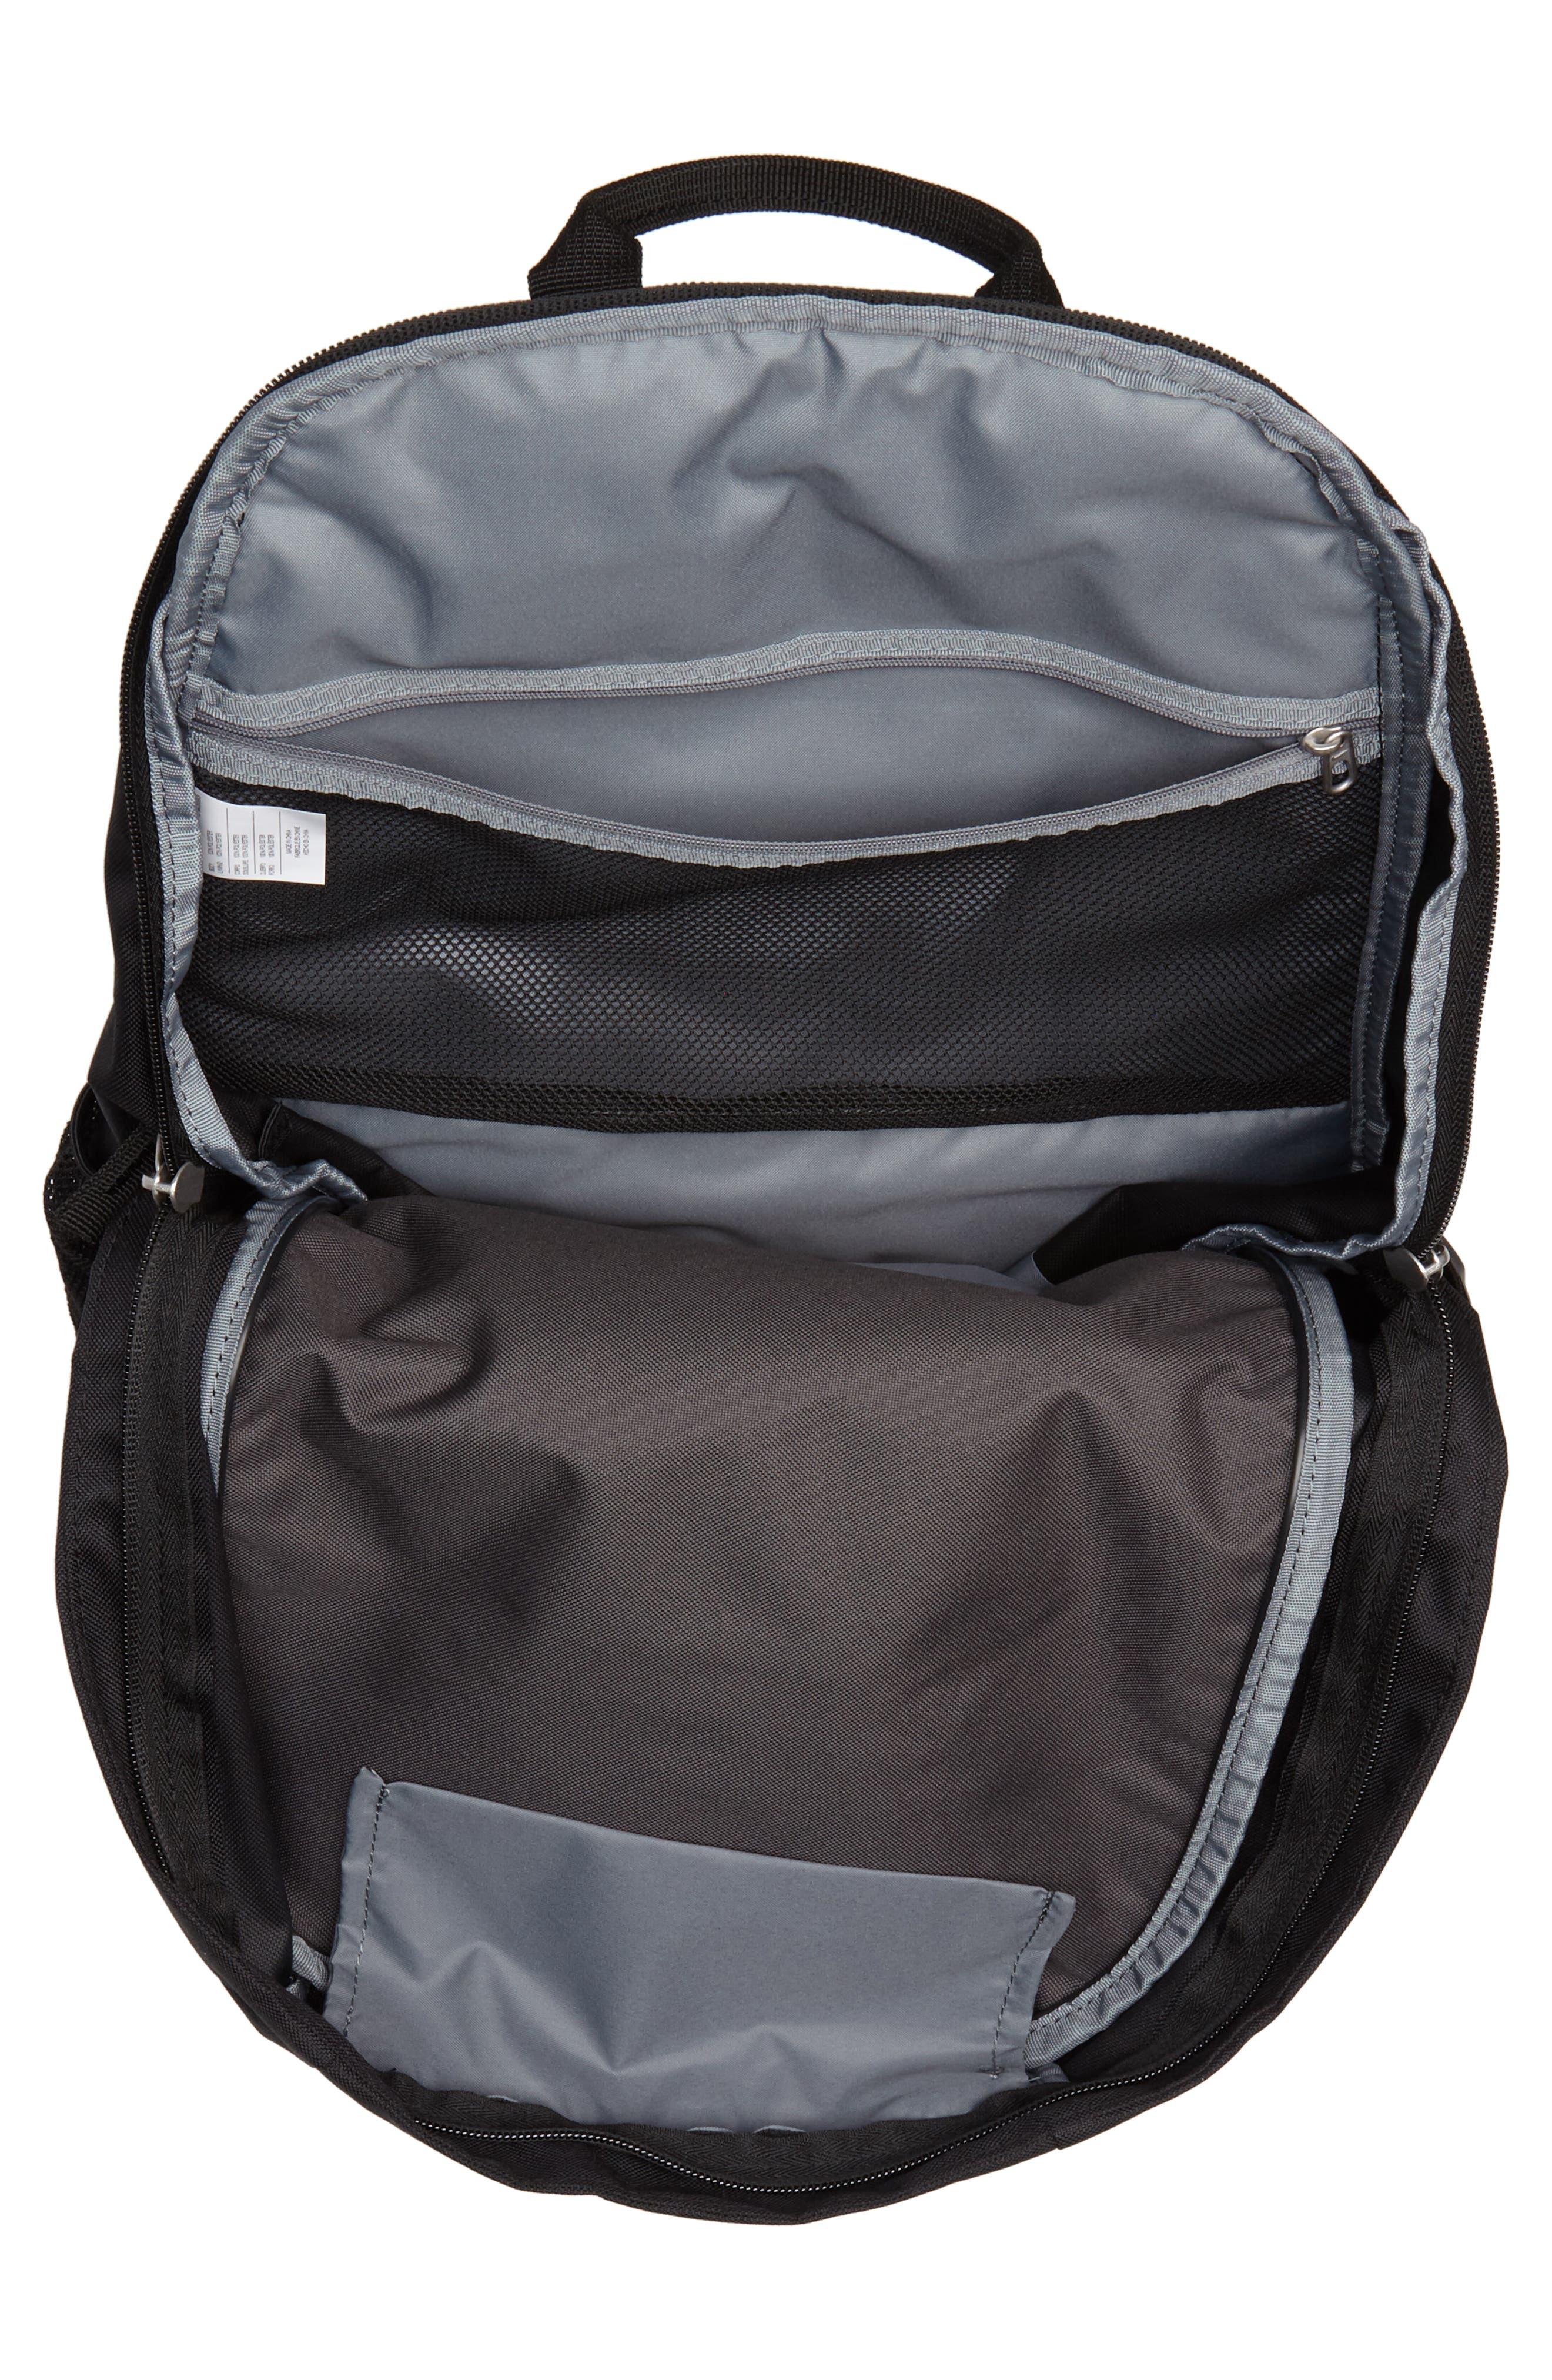 Club Team Backpack,                             Alternate thumbnail 4, color,                             010